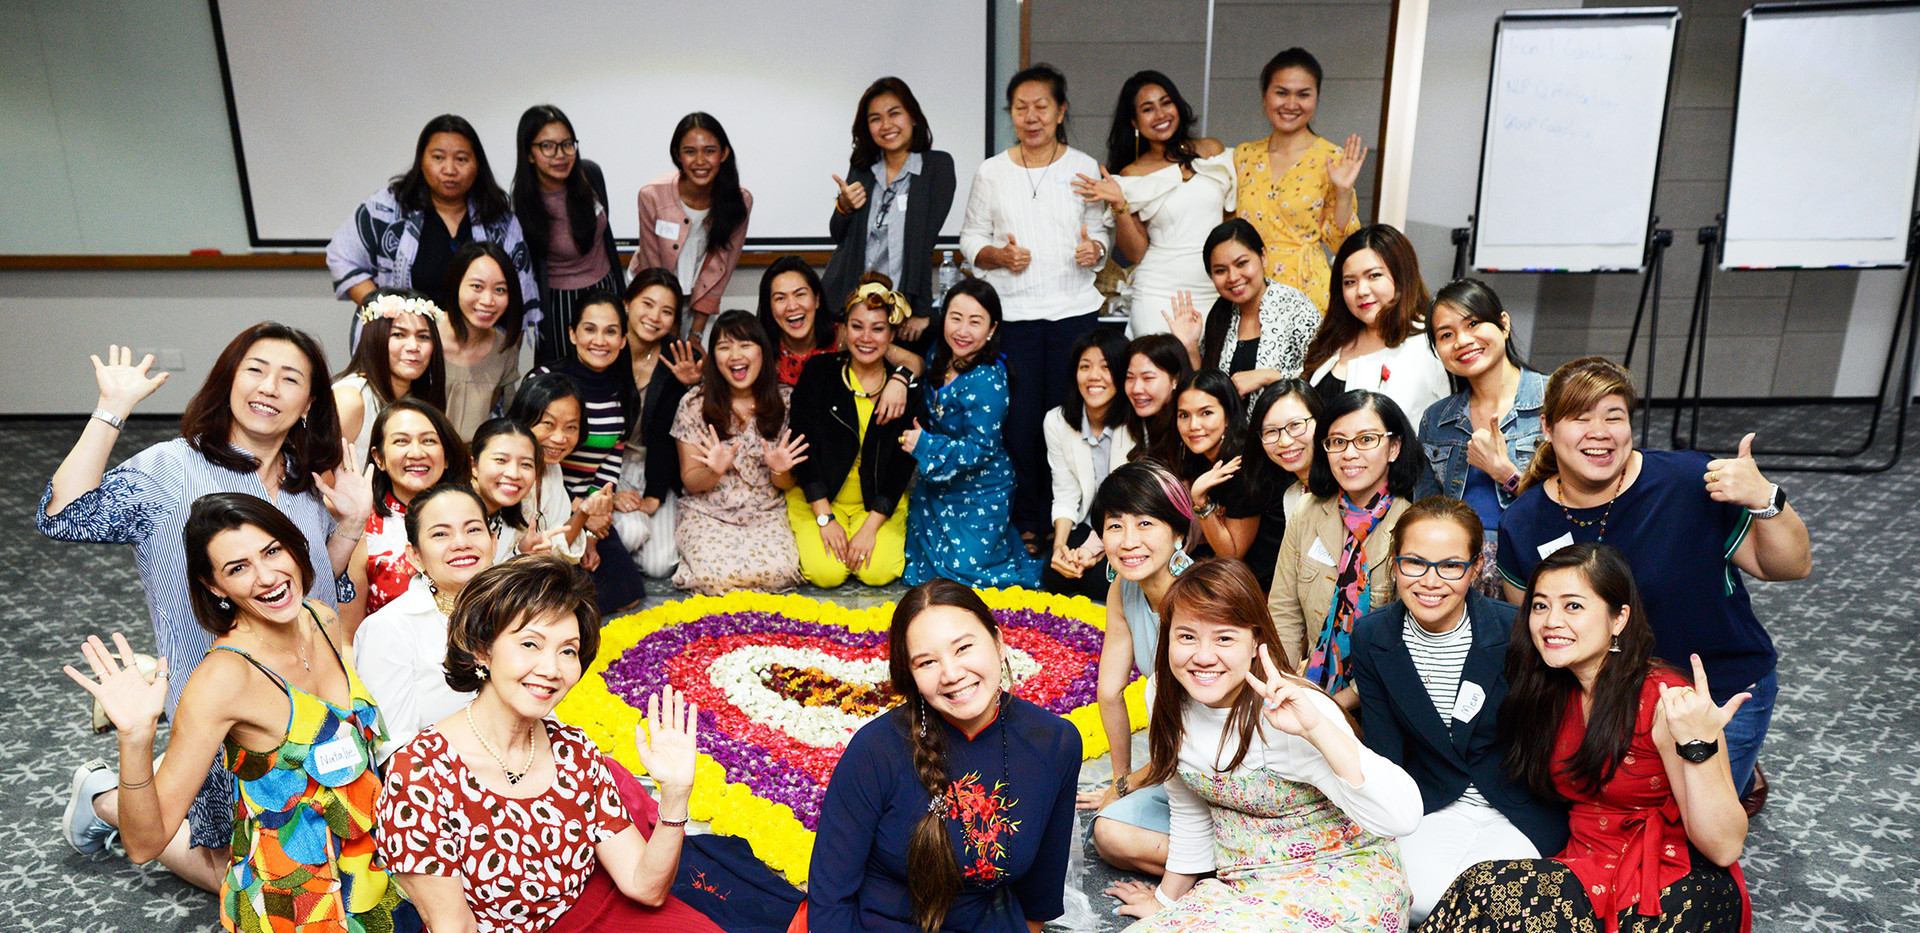 1 group photo.jpg